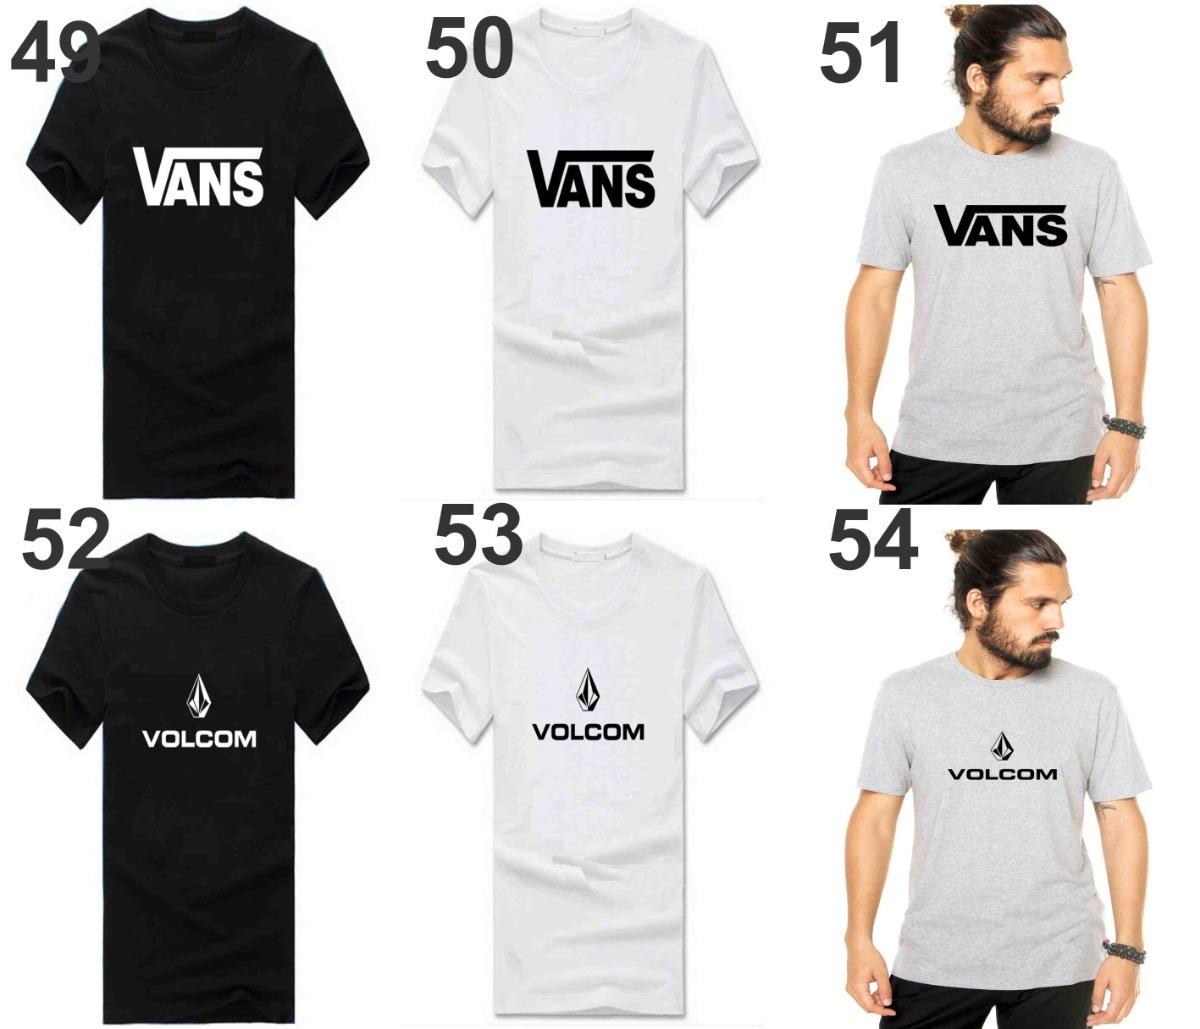 f59947c3f55 kit 5 camiseta masculina camisa blusa barata d marca oferta. Carregando  zoom.